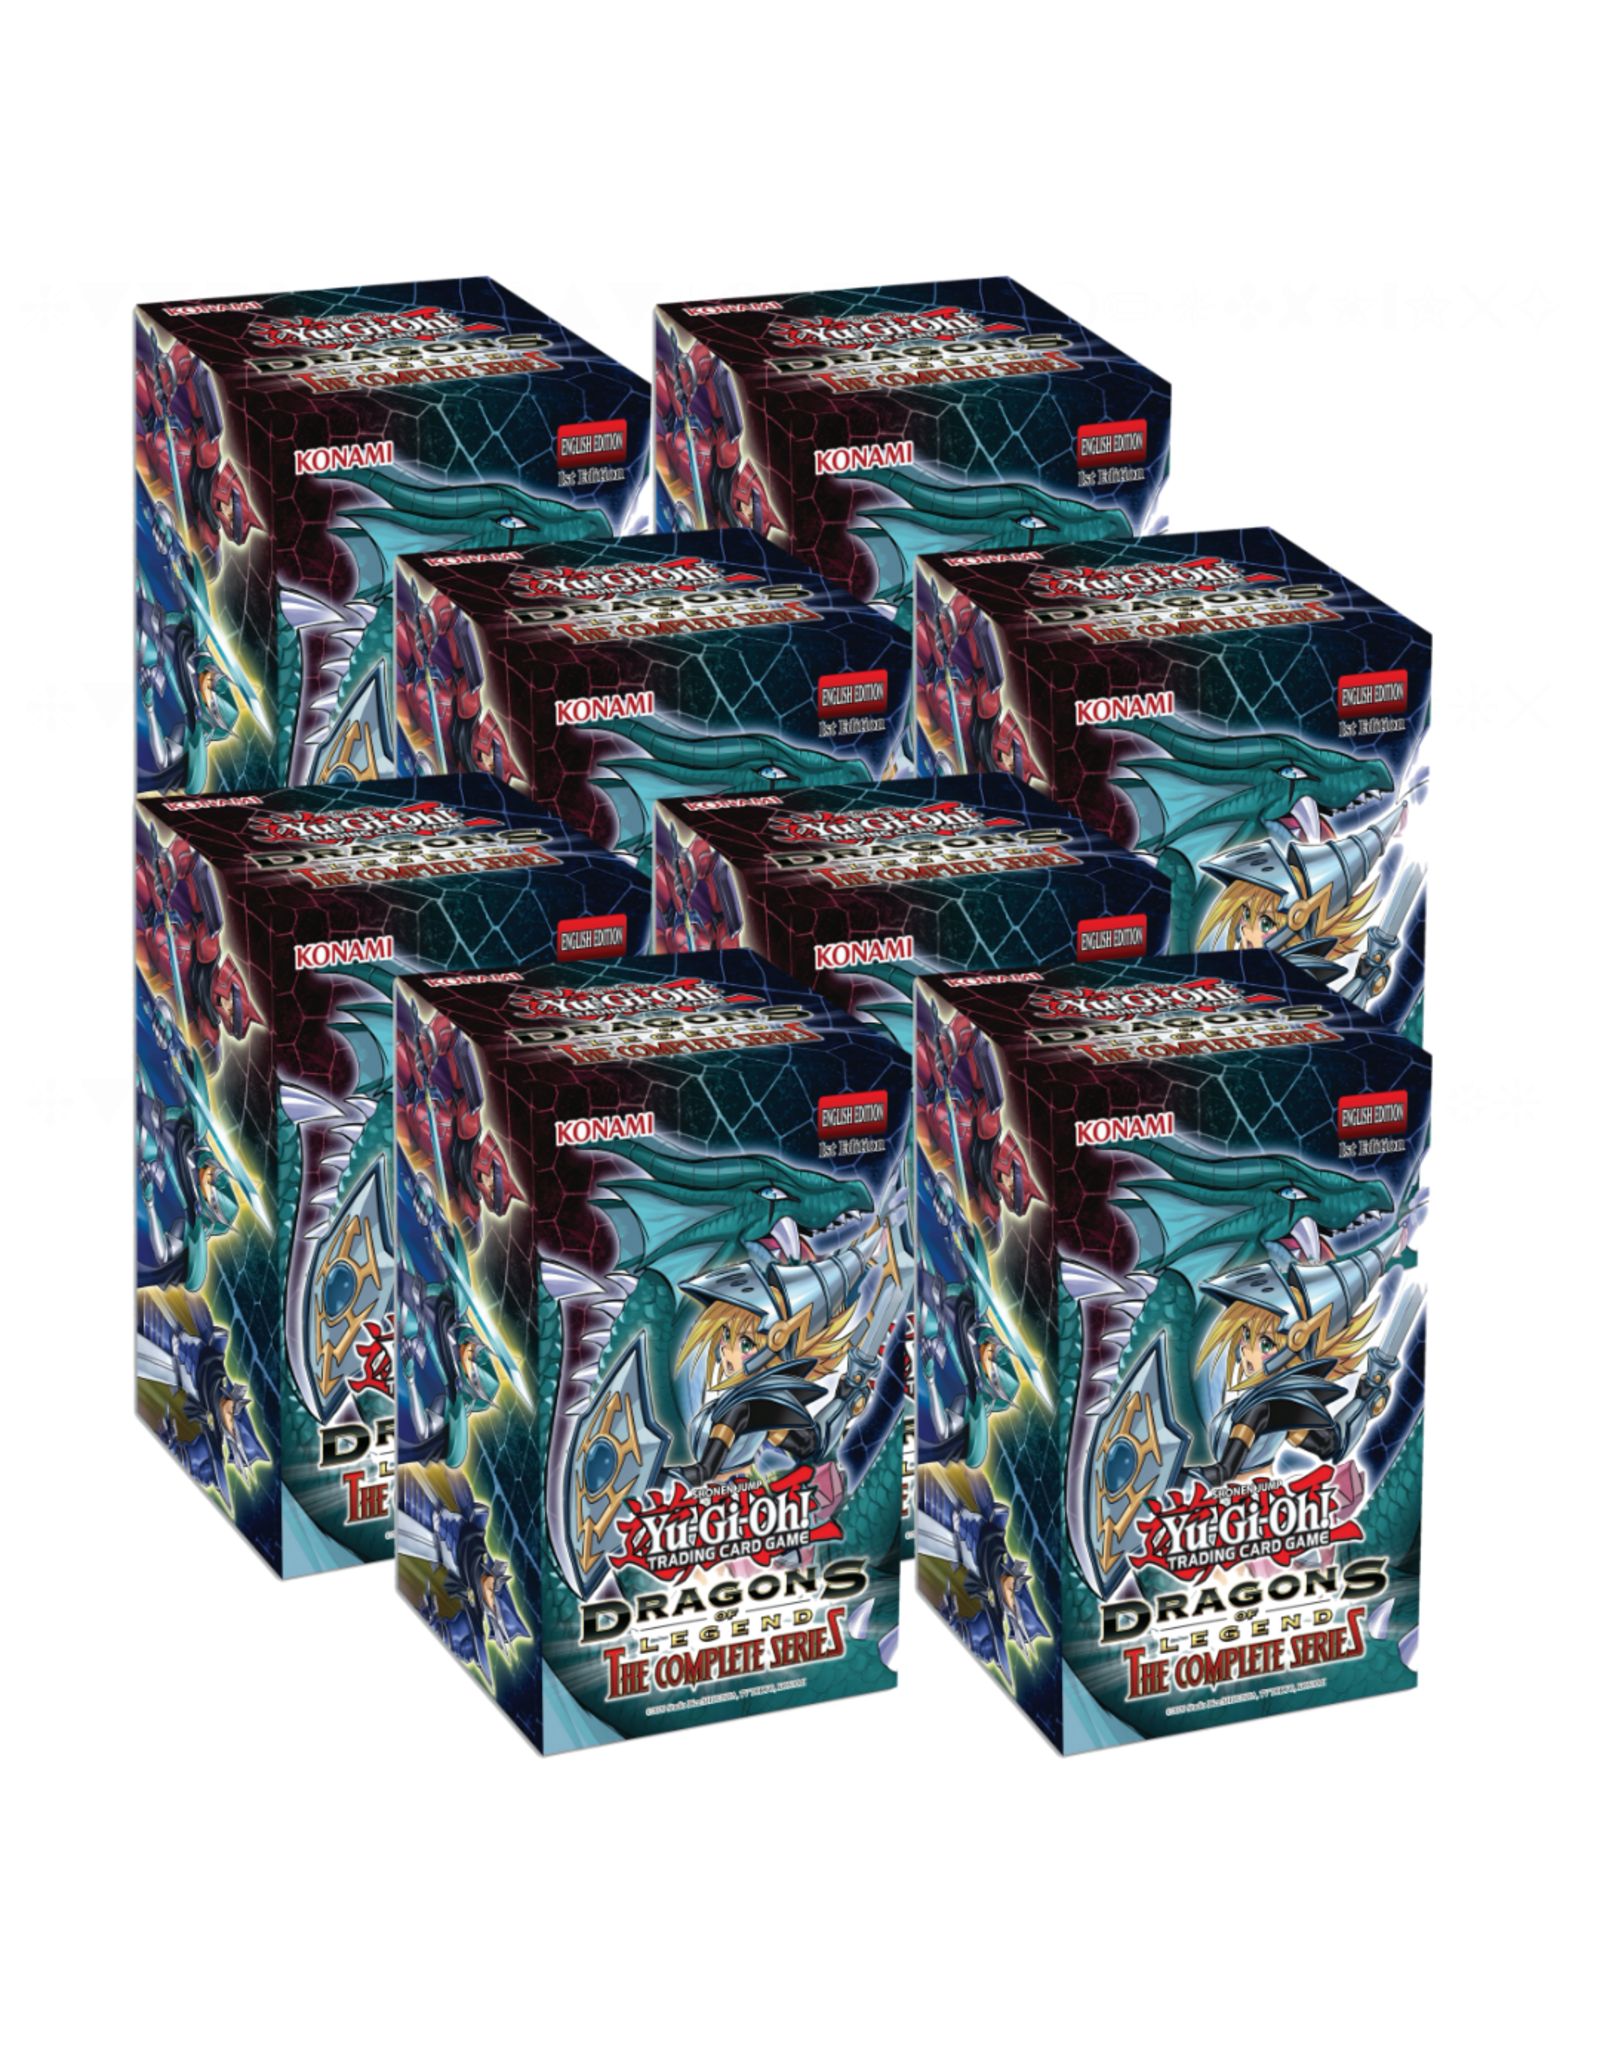 Konami Yu-Gi-Oh: Dragons of Legends - Complete Series Display Box